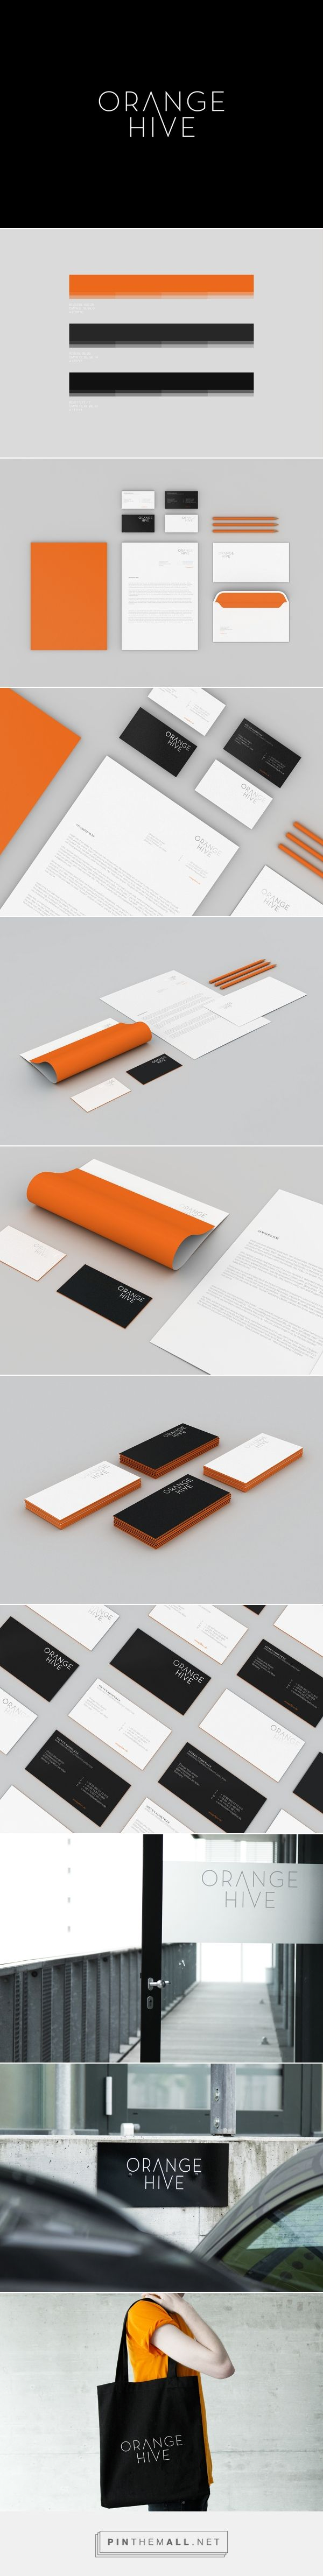 Orange Hive on Behance | Fivestar Branding – Design and Branding Agency & Inspiration Gallery